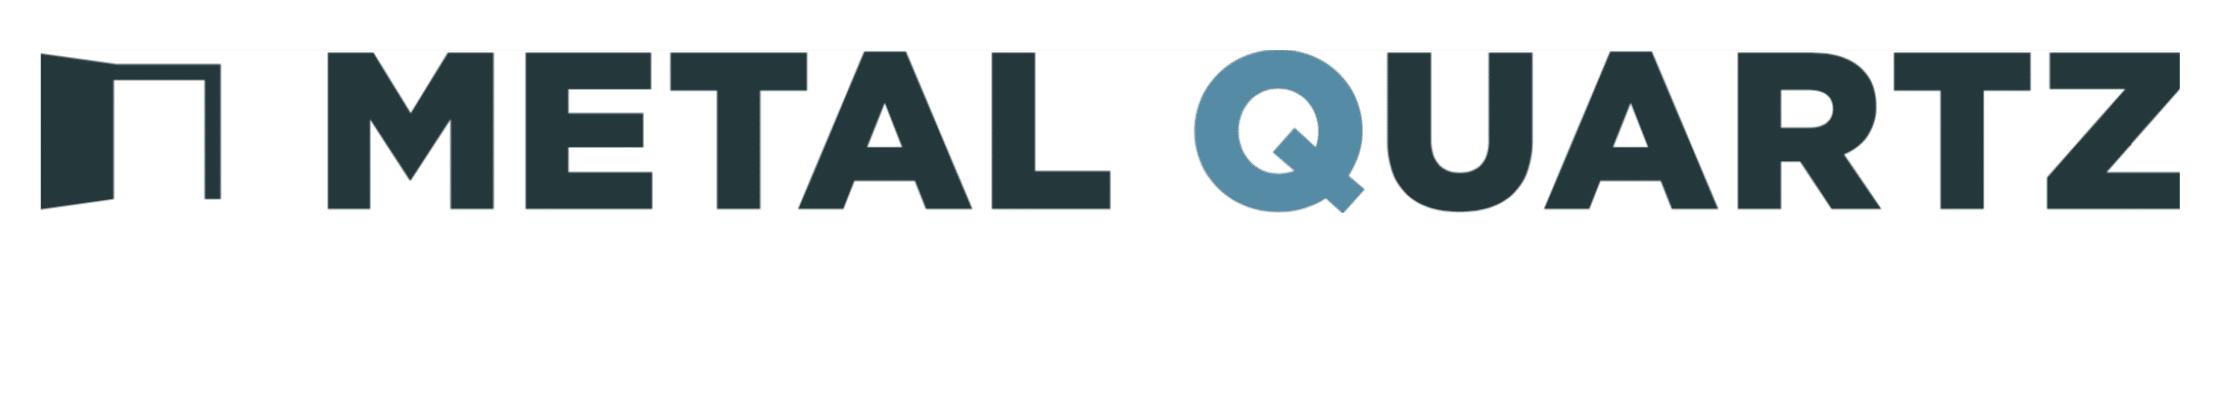 Metal Quartz